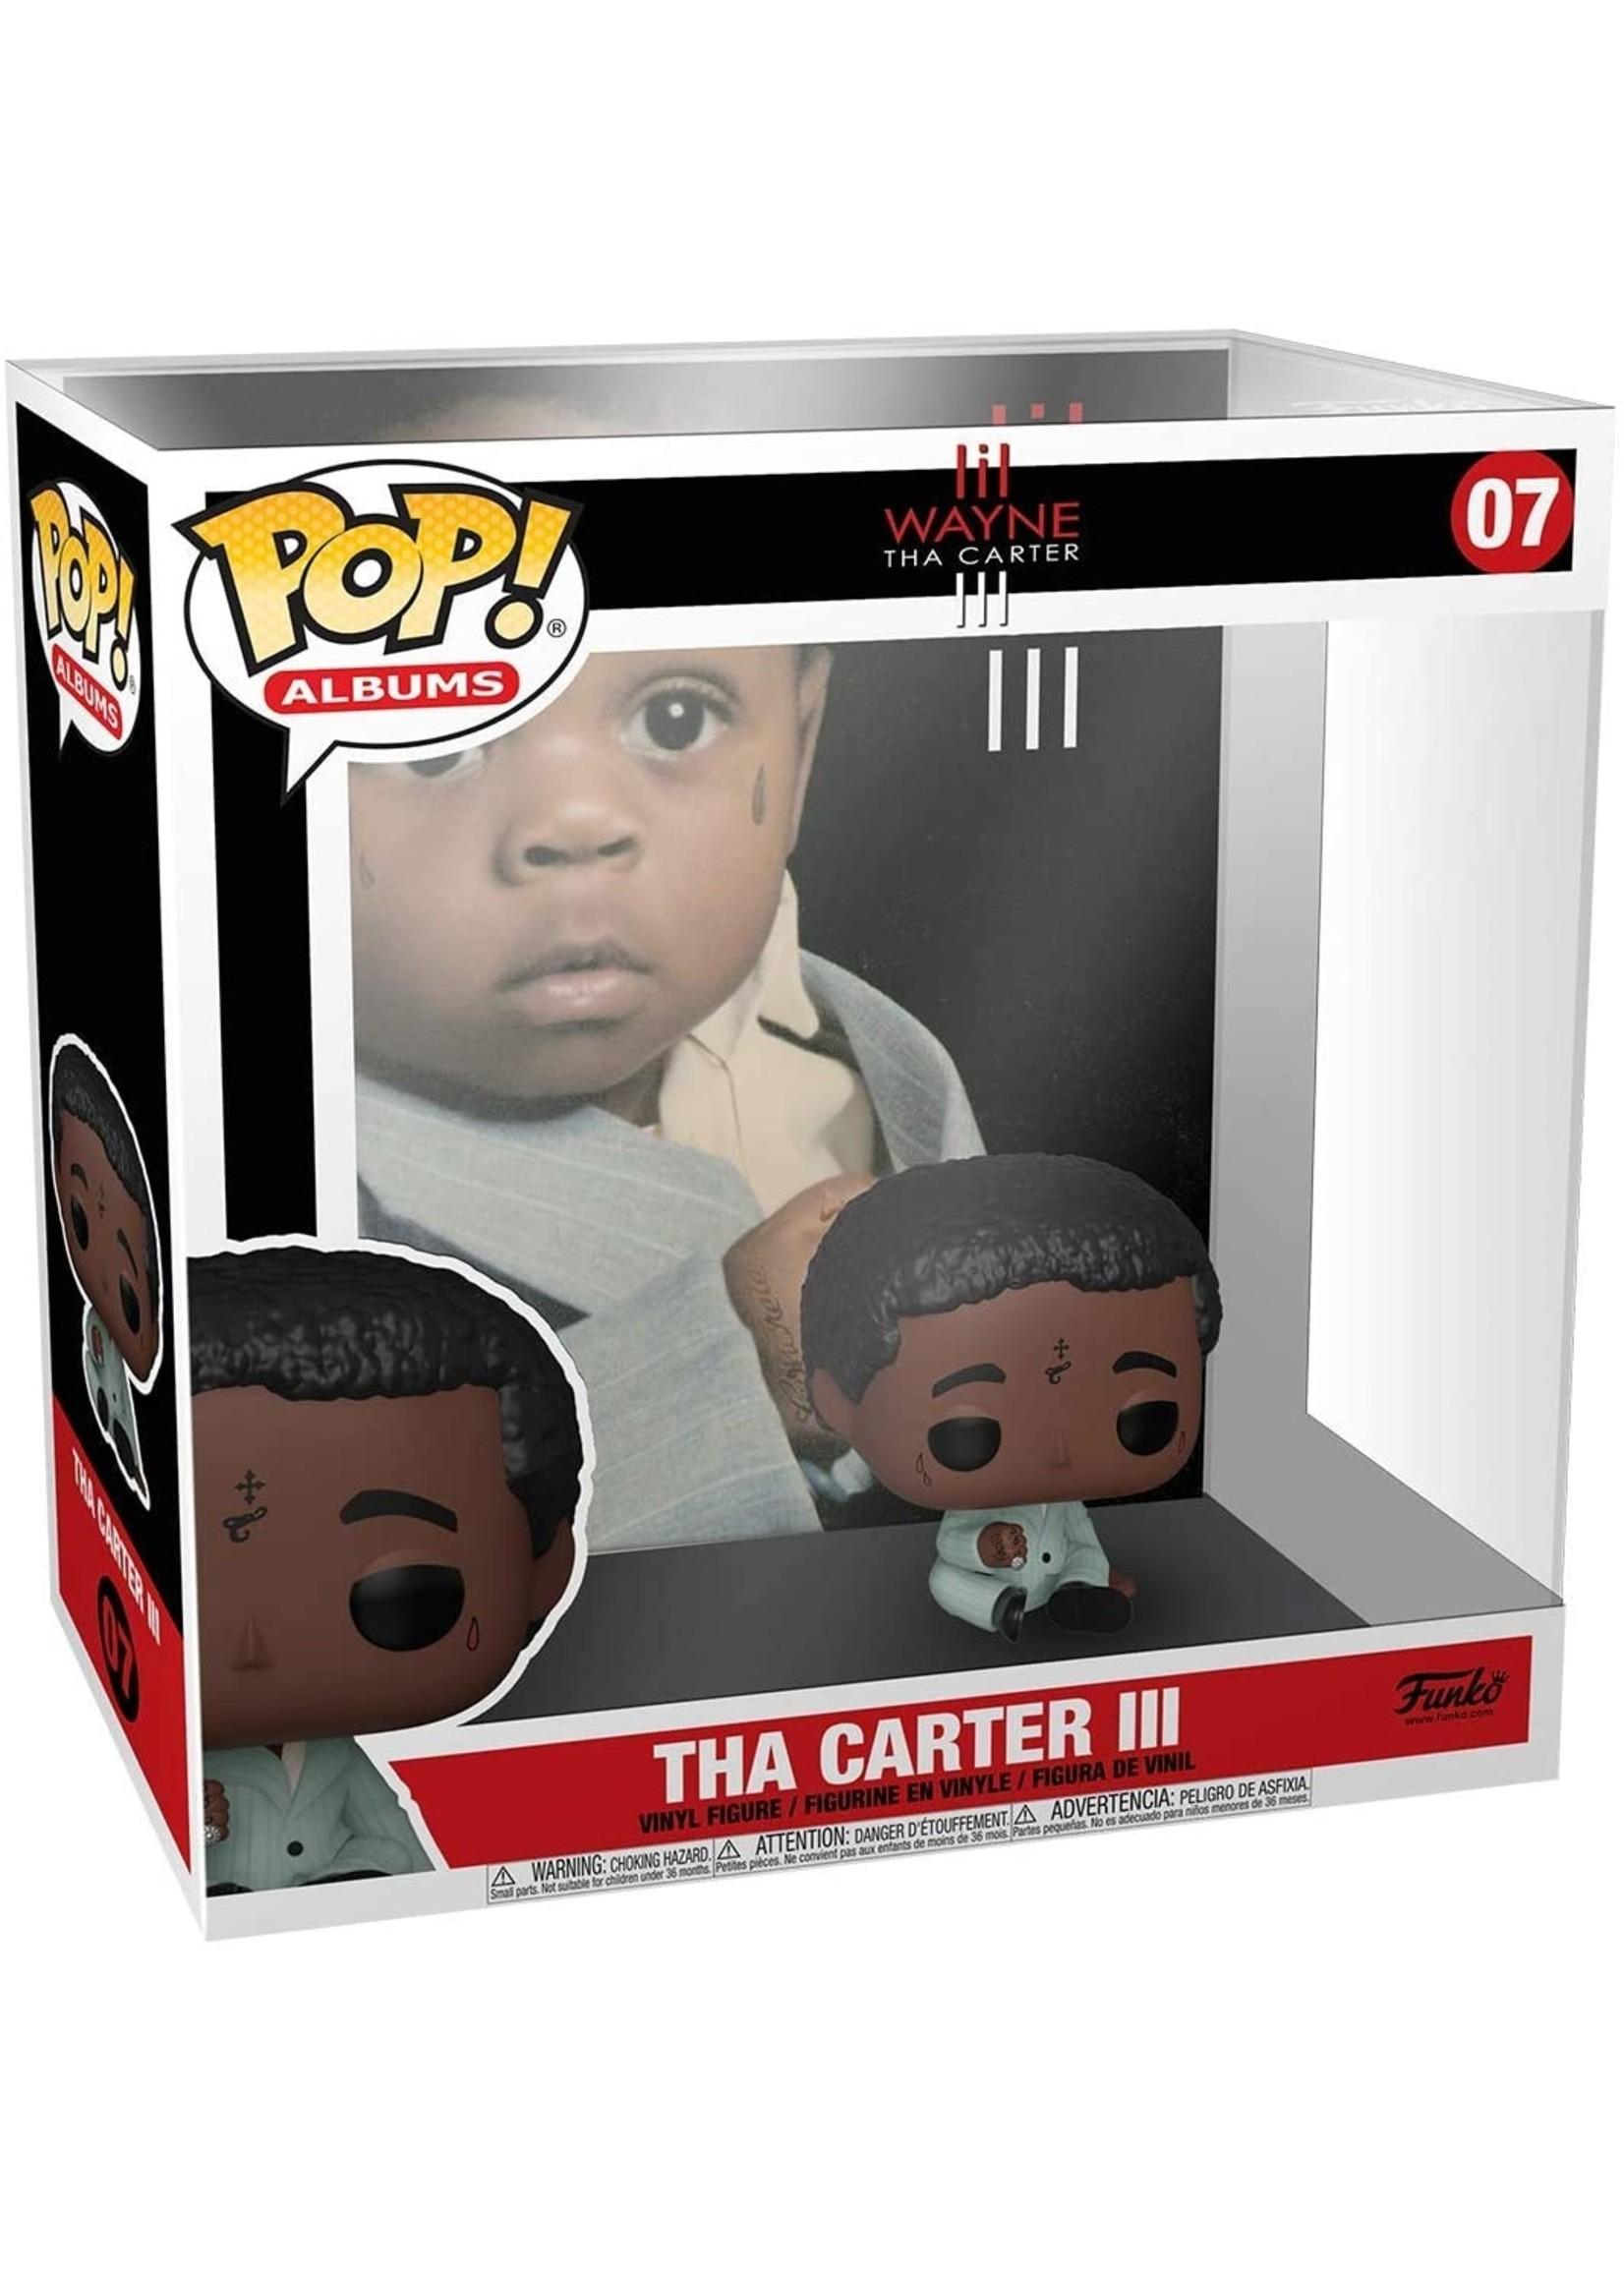 Lil Wayne Tha Carter III Album Vinyl Figure